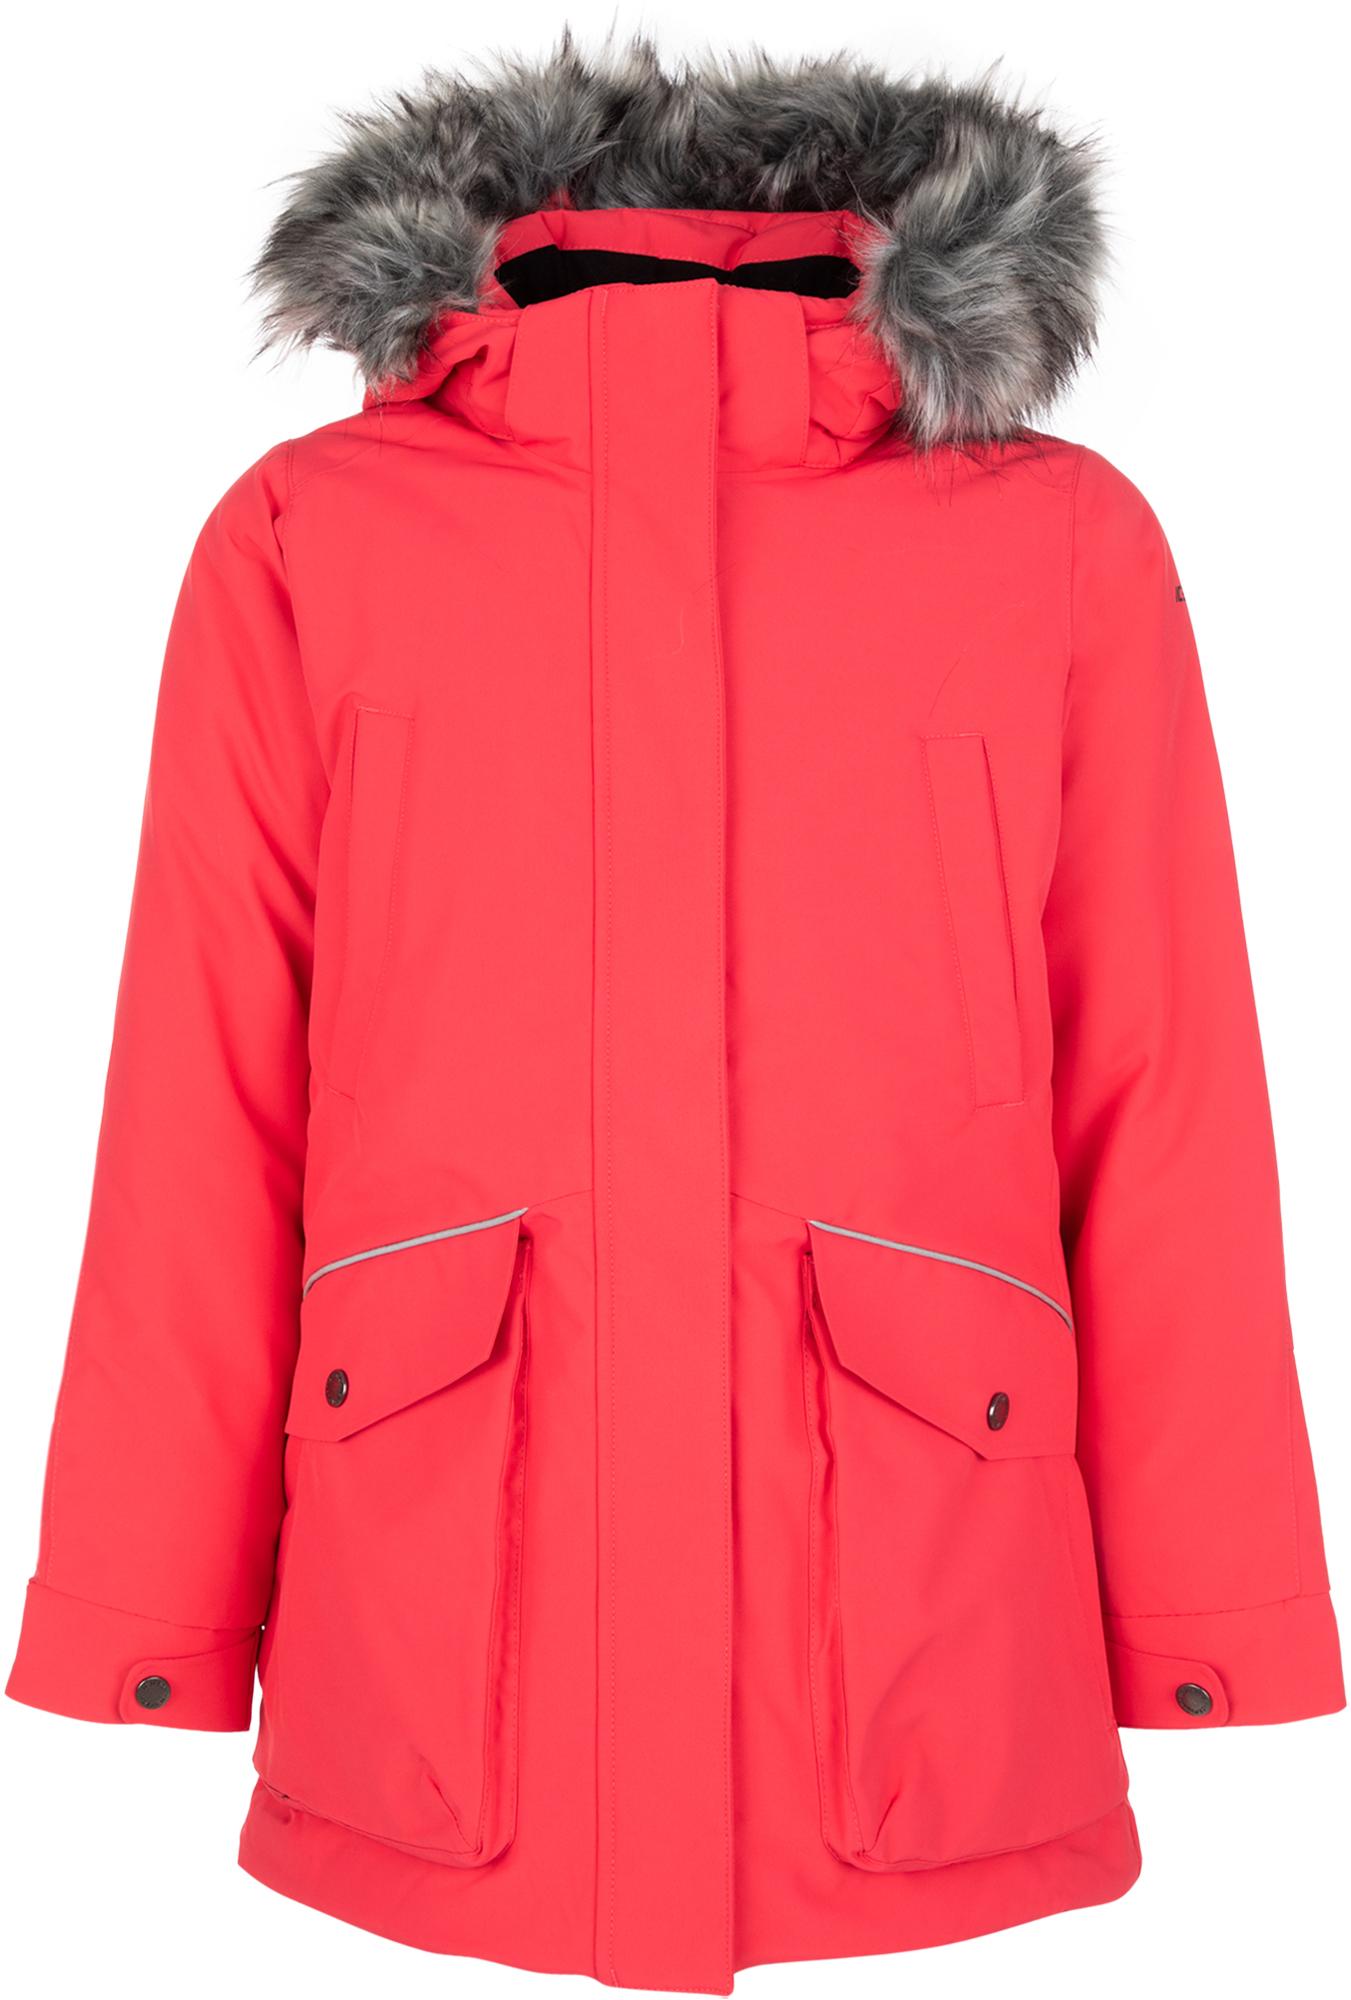 IcePeak Куртка утепленная для девочек IcePeak Kite, размер 164 костюм куртка брюки для девочек icepeak 452002654iv цвет фиолетовый р 164 100%полиэстер 740